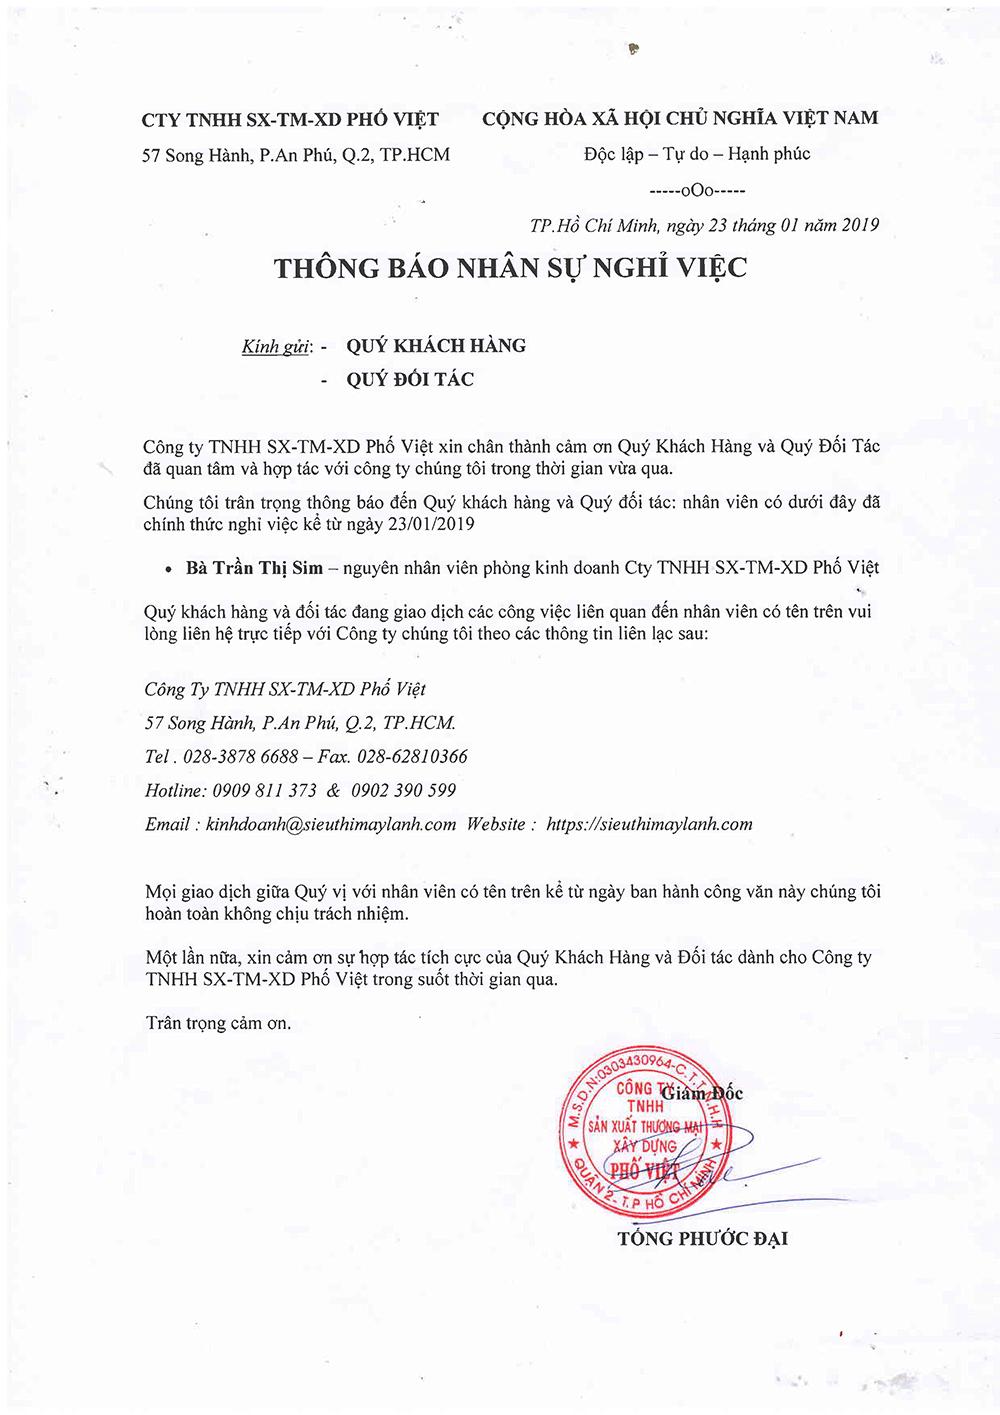 Scan-Thong-bao-NV-nghi-viec-sieuthimaylanh